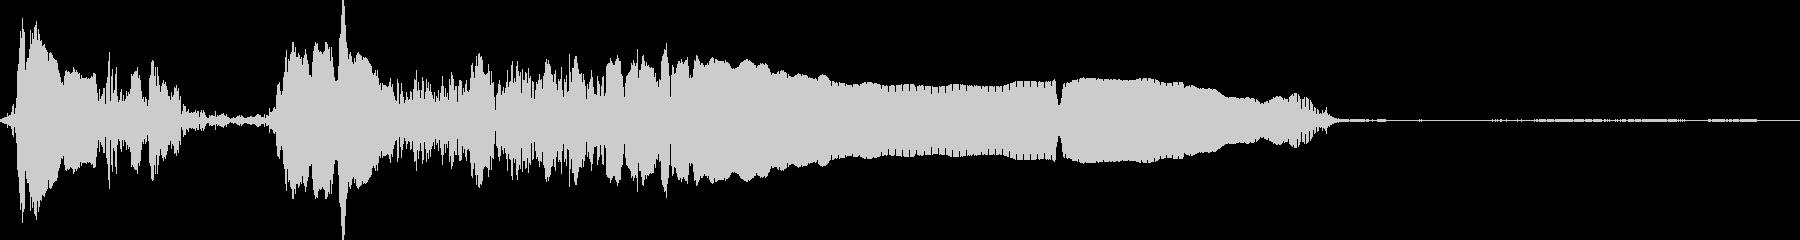 oster早朝のカラスの未再生の波形